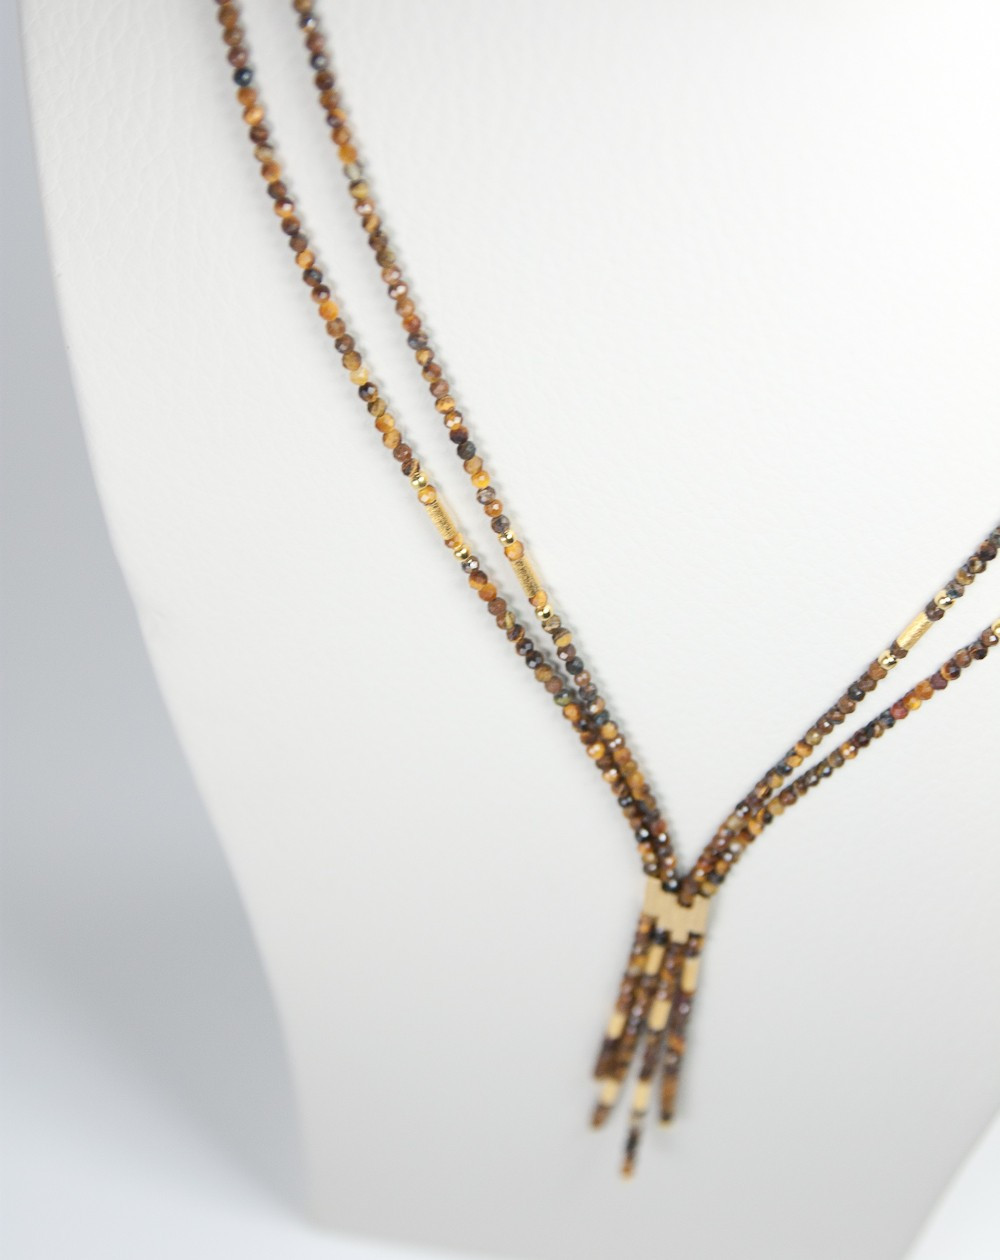 Collier 2 rangs en Oeil de tigre, Collection épure, Sanuk création